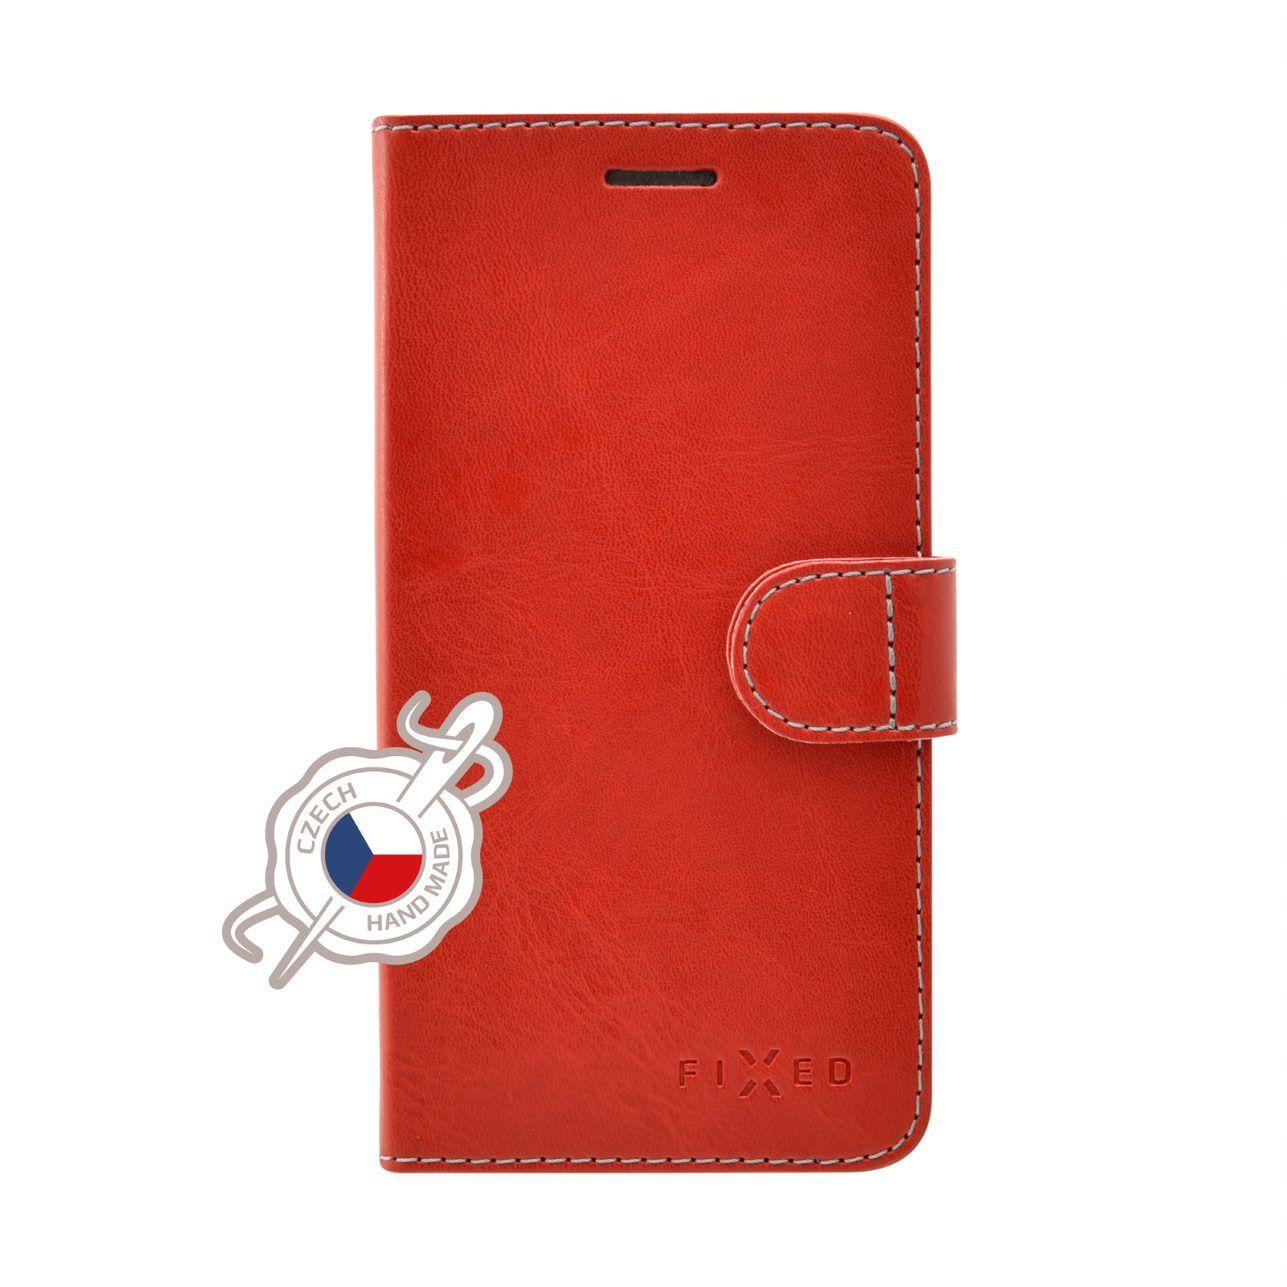 Pouzdro typu kniha FIXED FIT pro Xiaomi Redmi 5 Global, červené